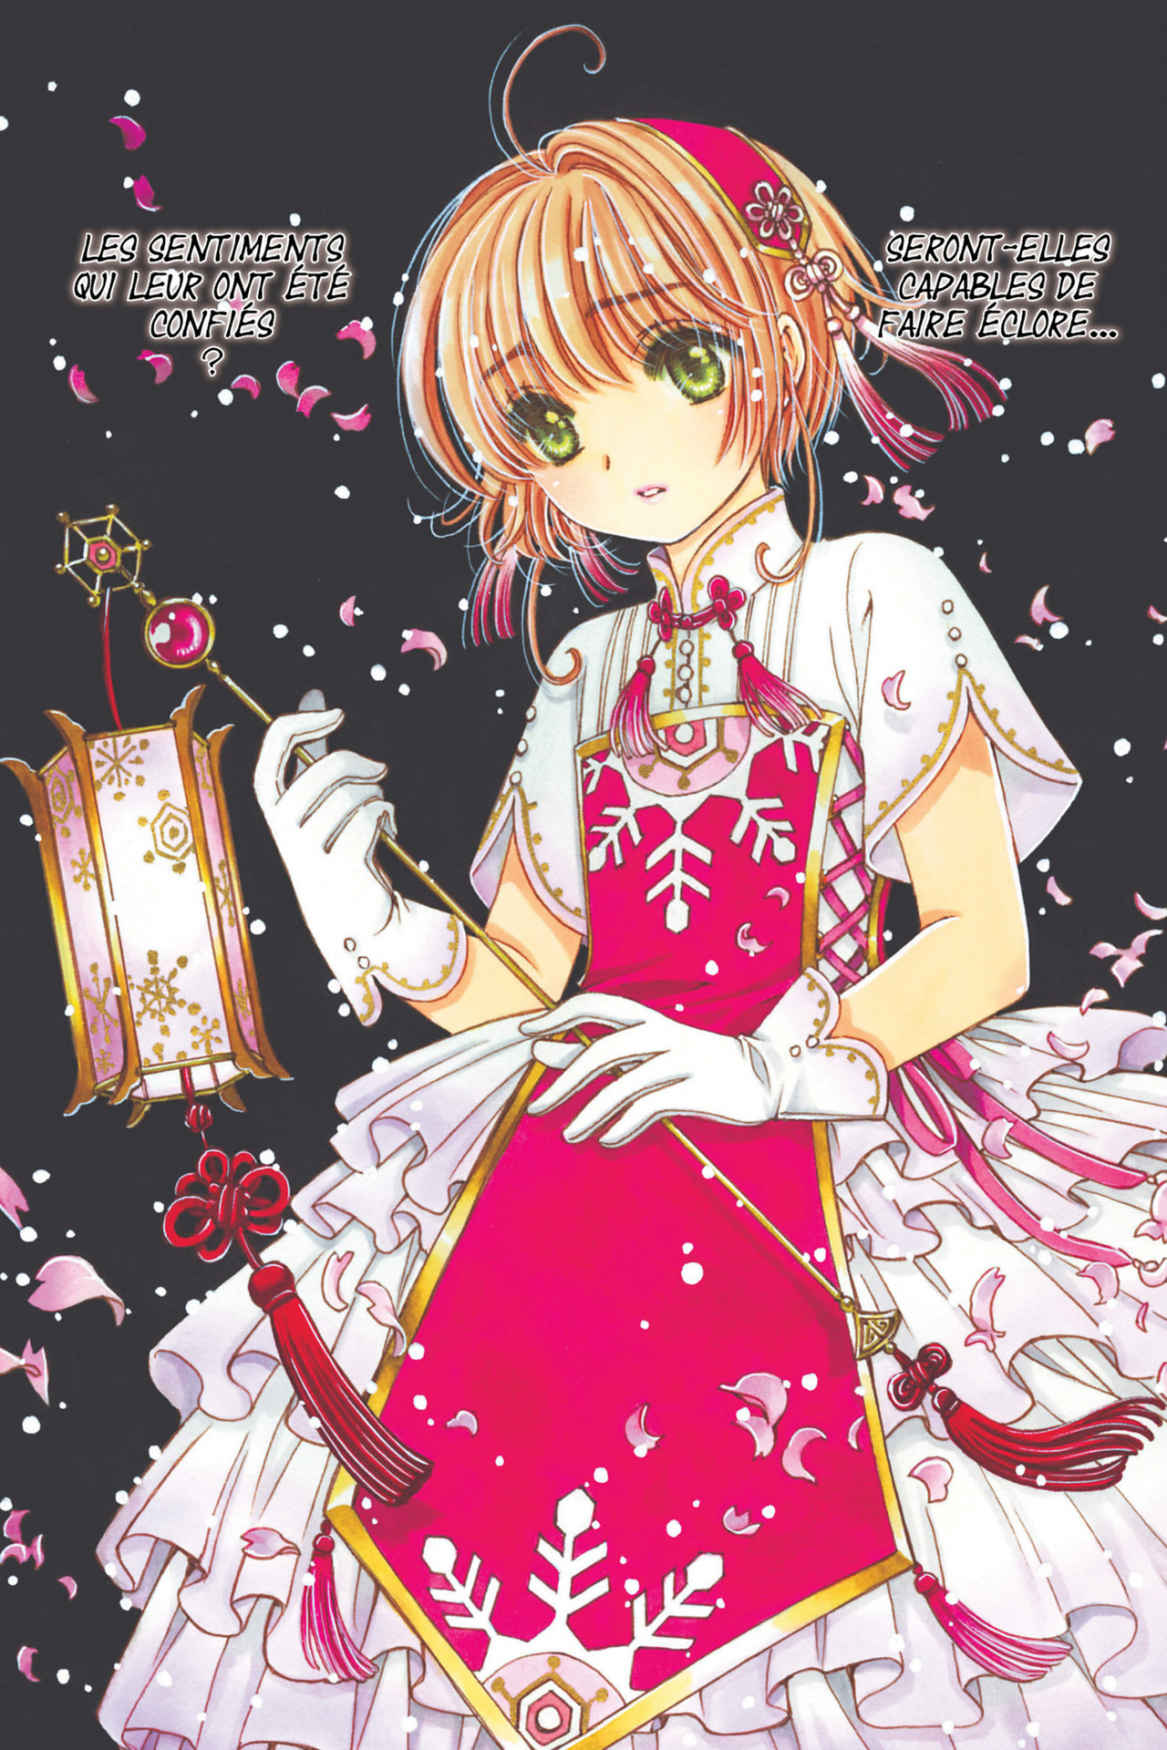 Card Captor Sakura et autres mangas [CLAMP] - Page 39 Cardca14